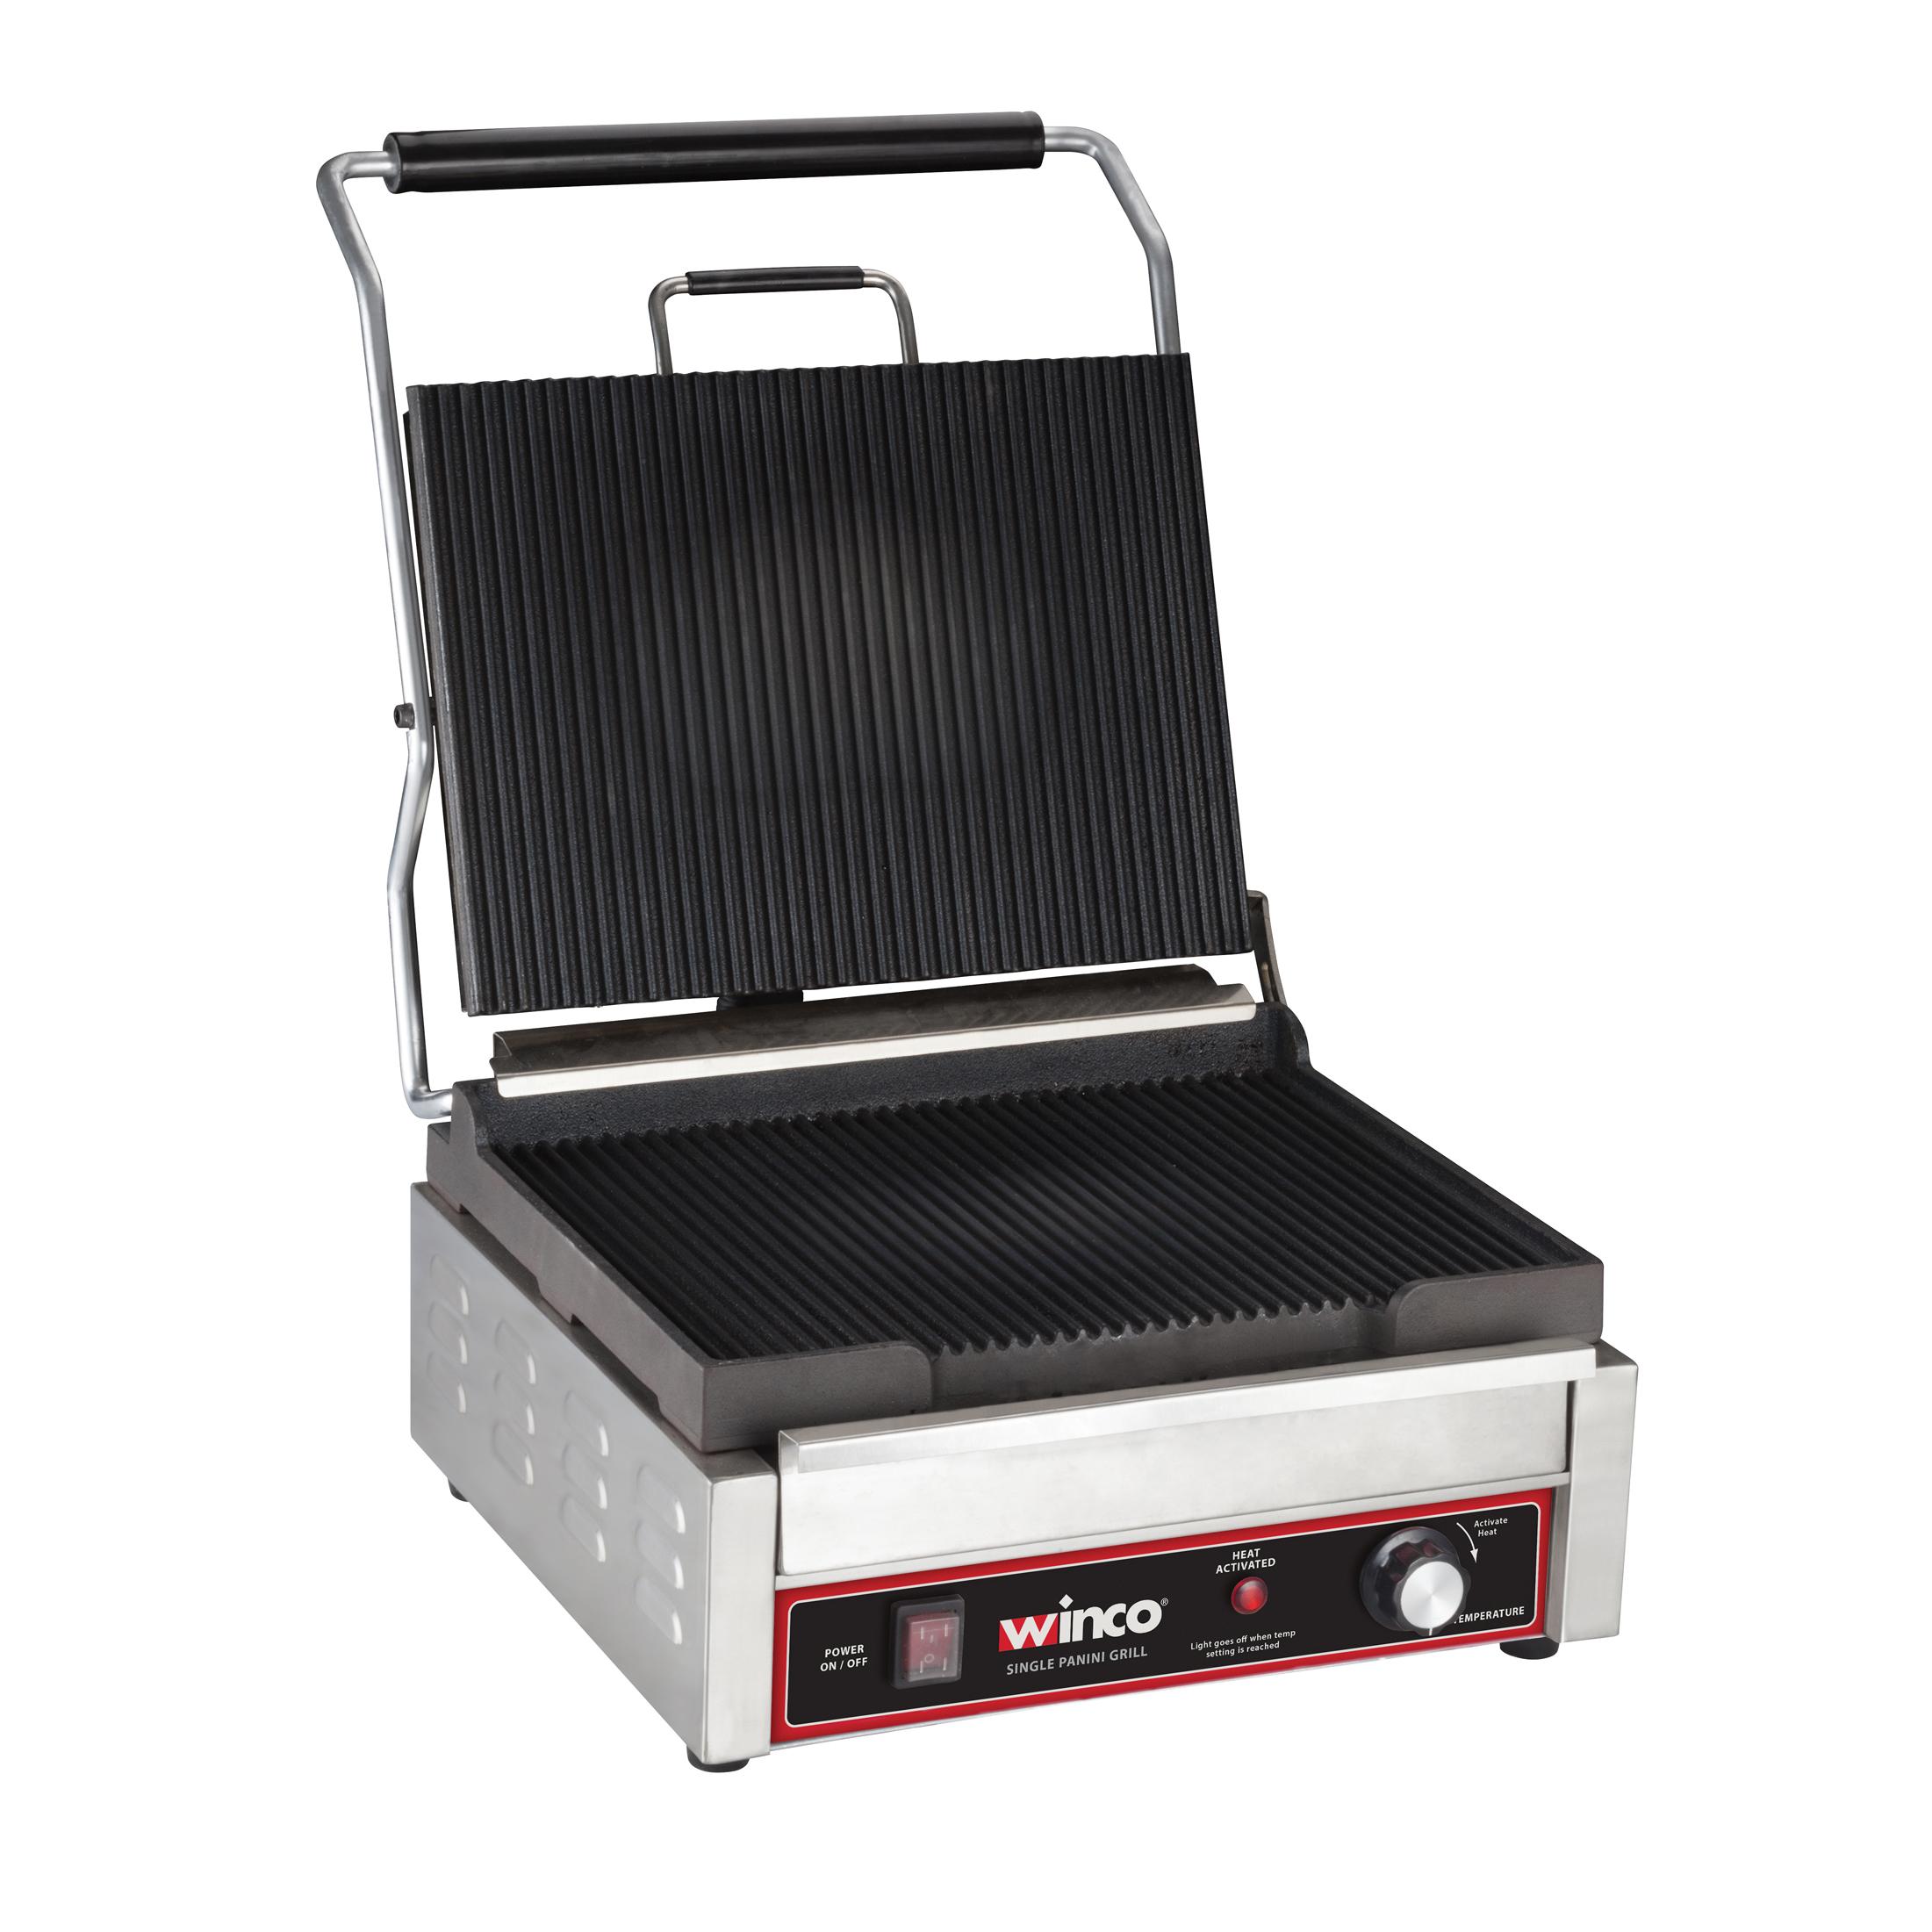 Winco EPG-1C sandwich / panini grill